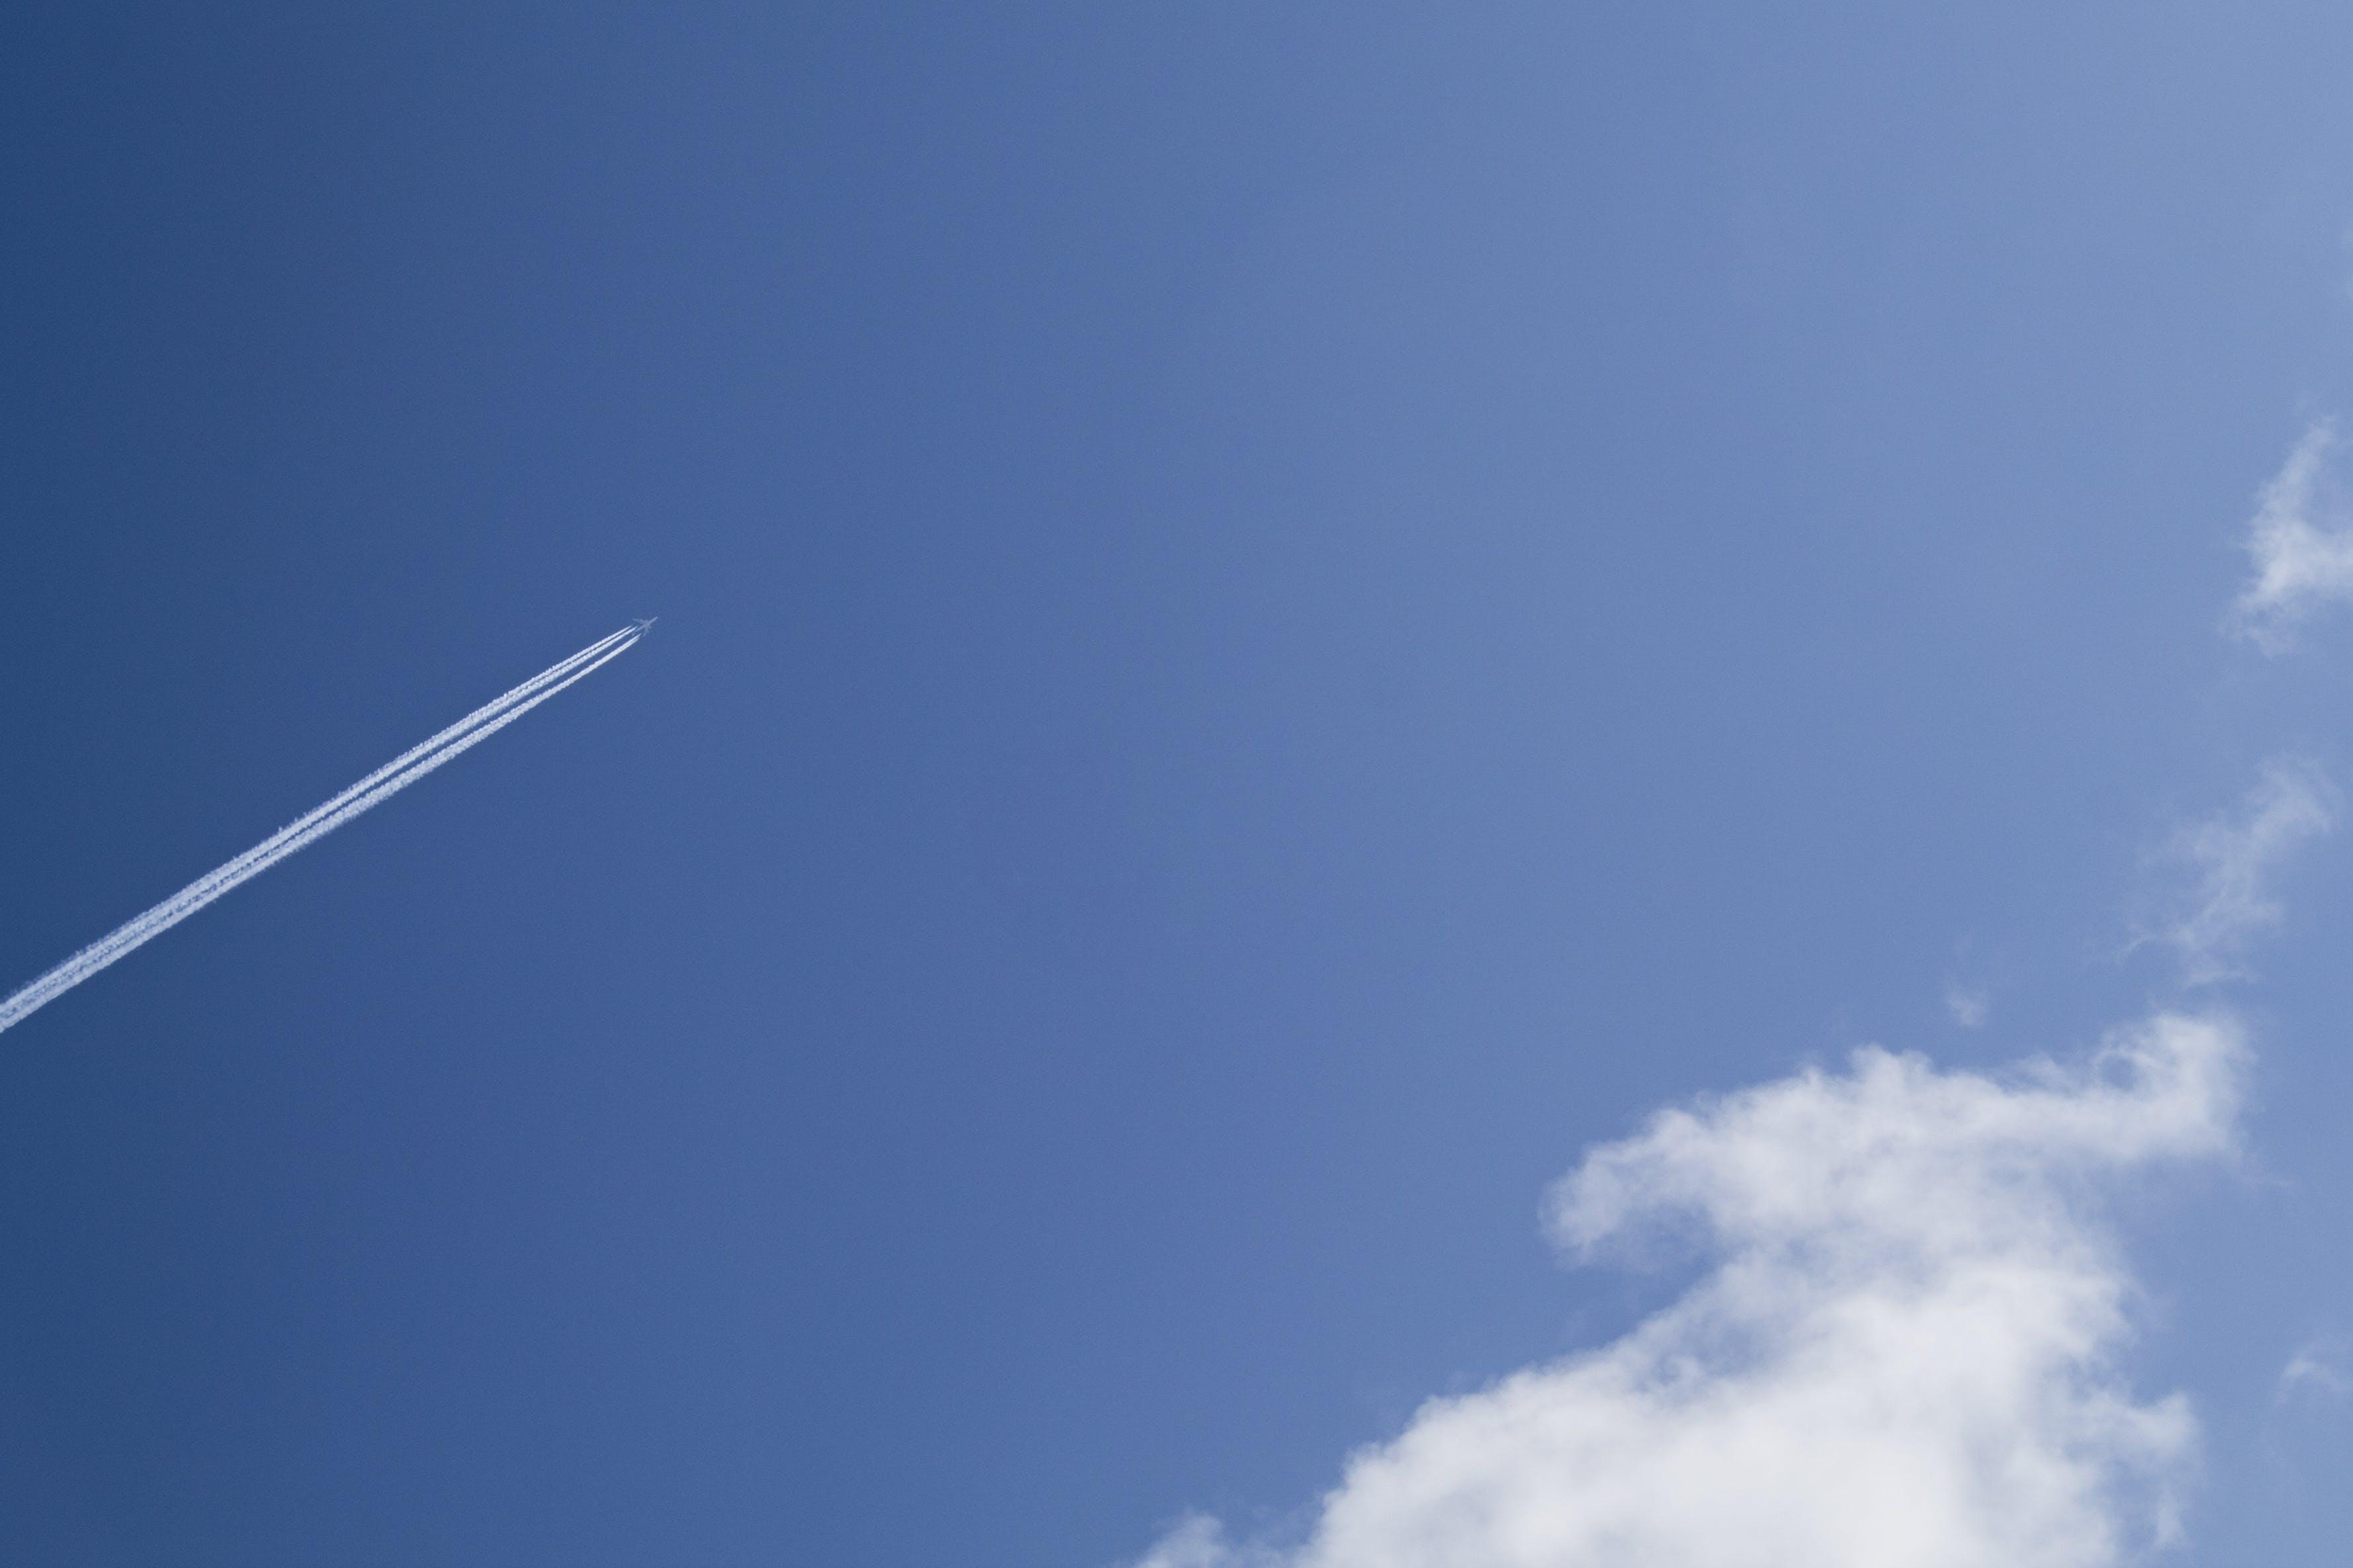 Jet Under Clear Blue Sky during Daytime